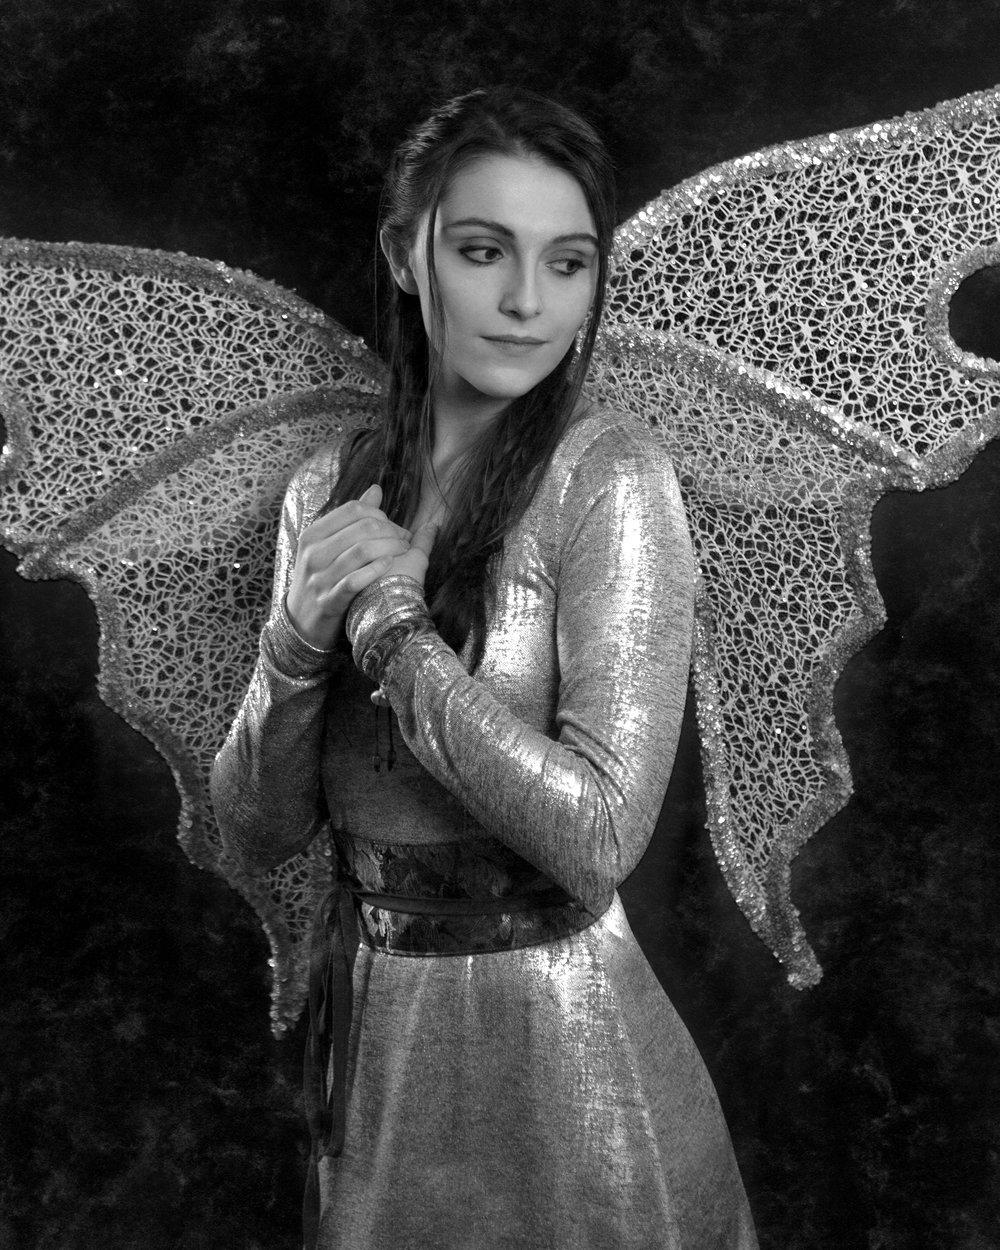 Maiah Wynne Wings Dress v1 8x10 BLKnWT.jpg